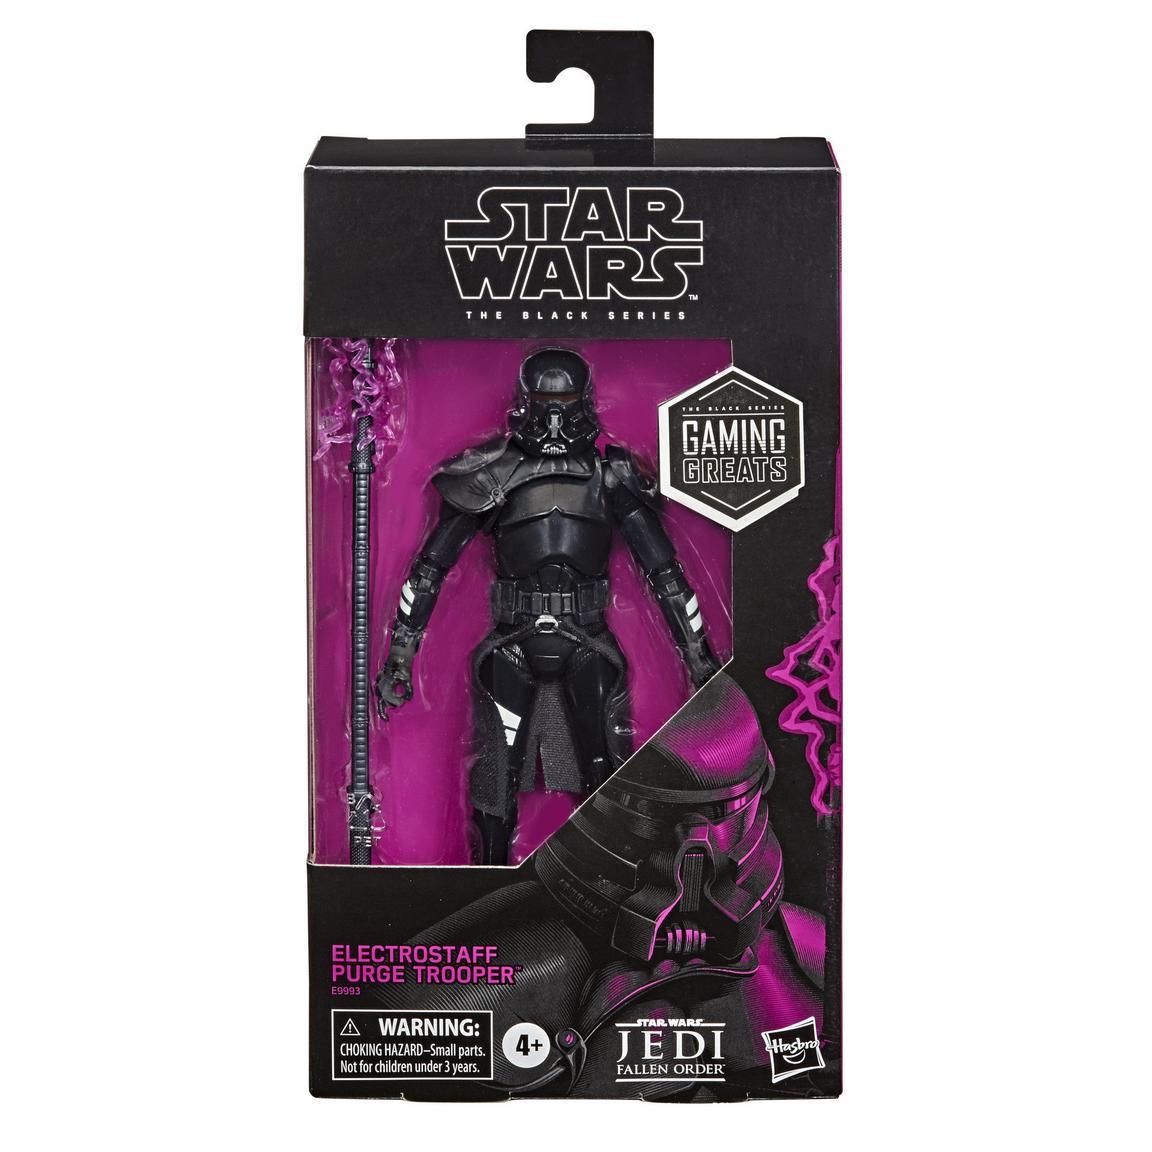 Star Wars The Black Series Jedi: Fallen Order Electrostaff Purge Trooper 6-inch画像